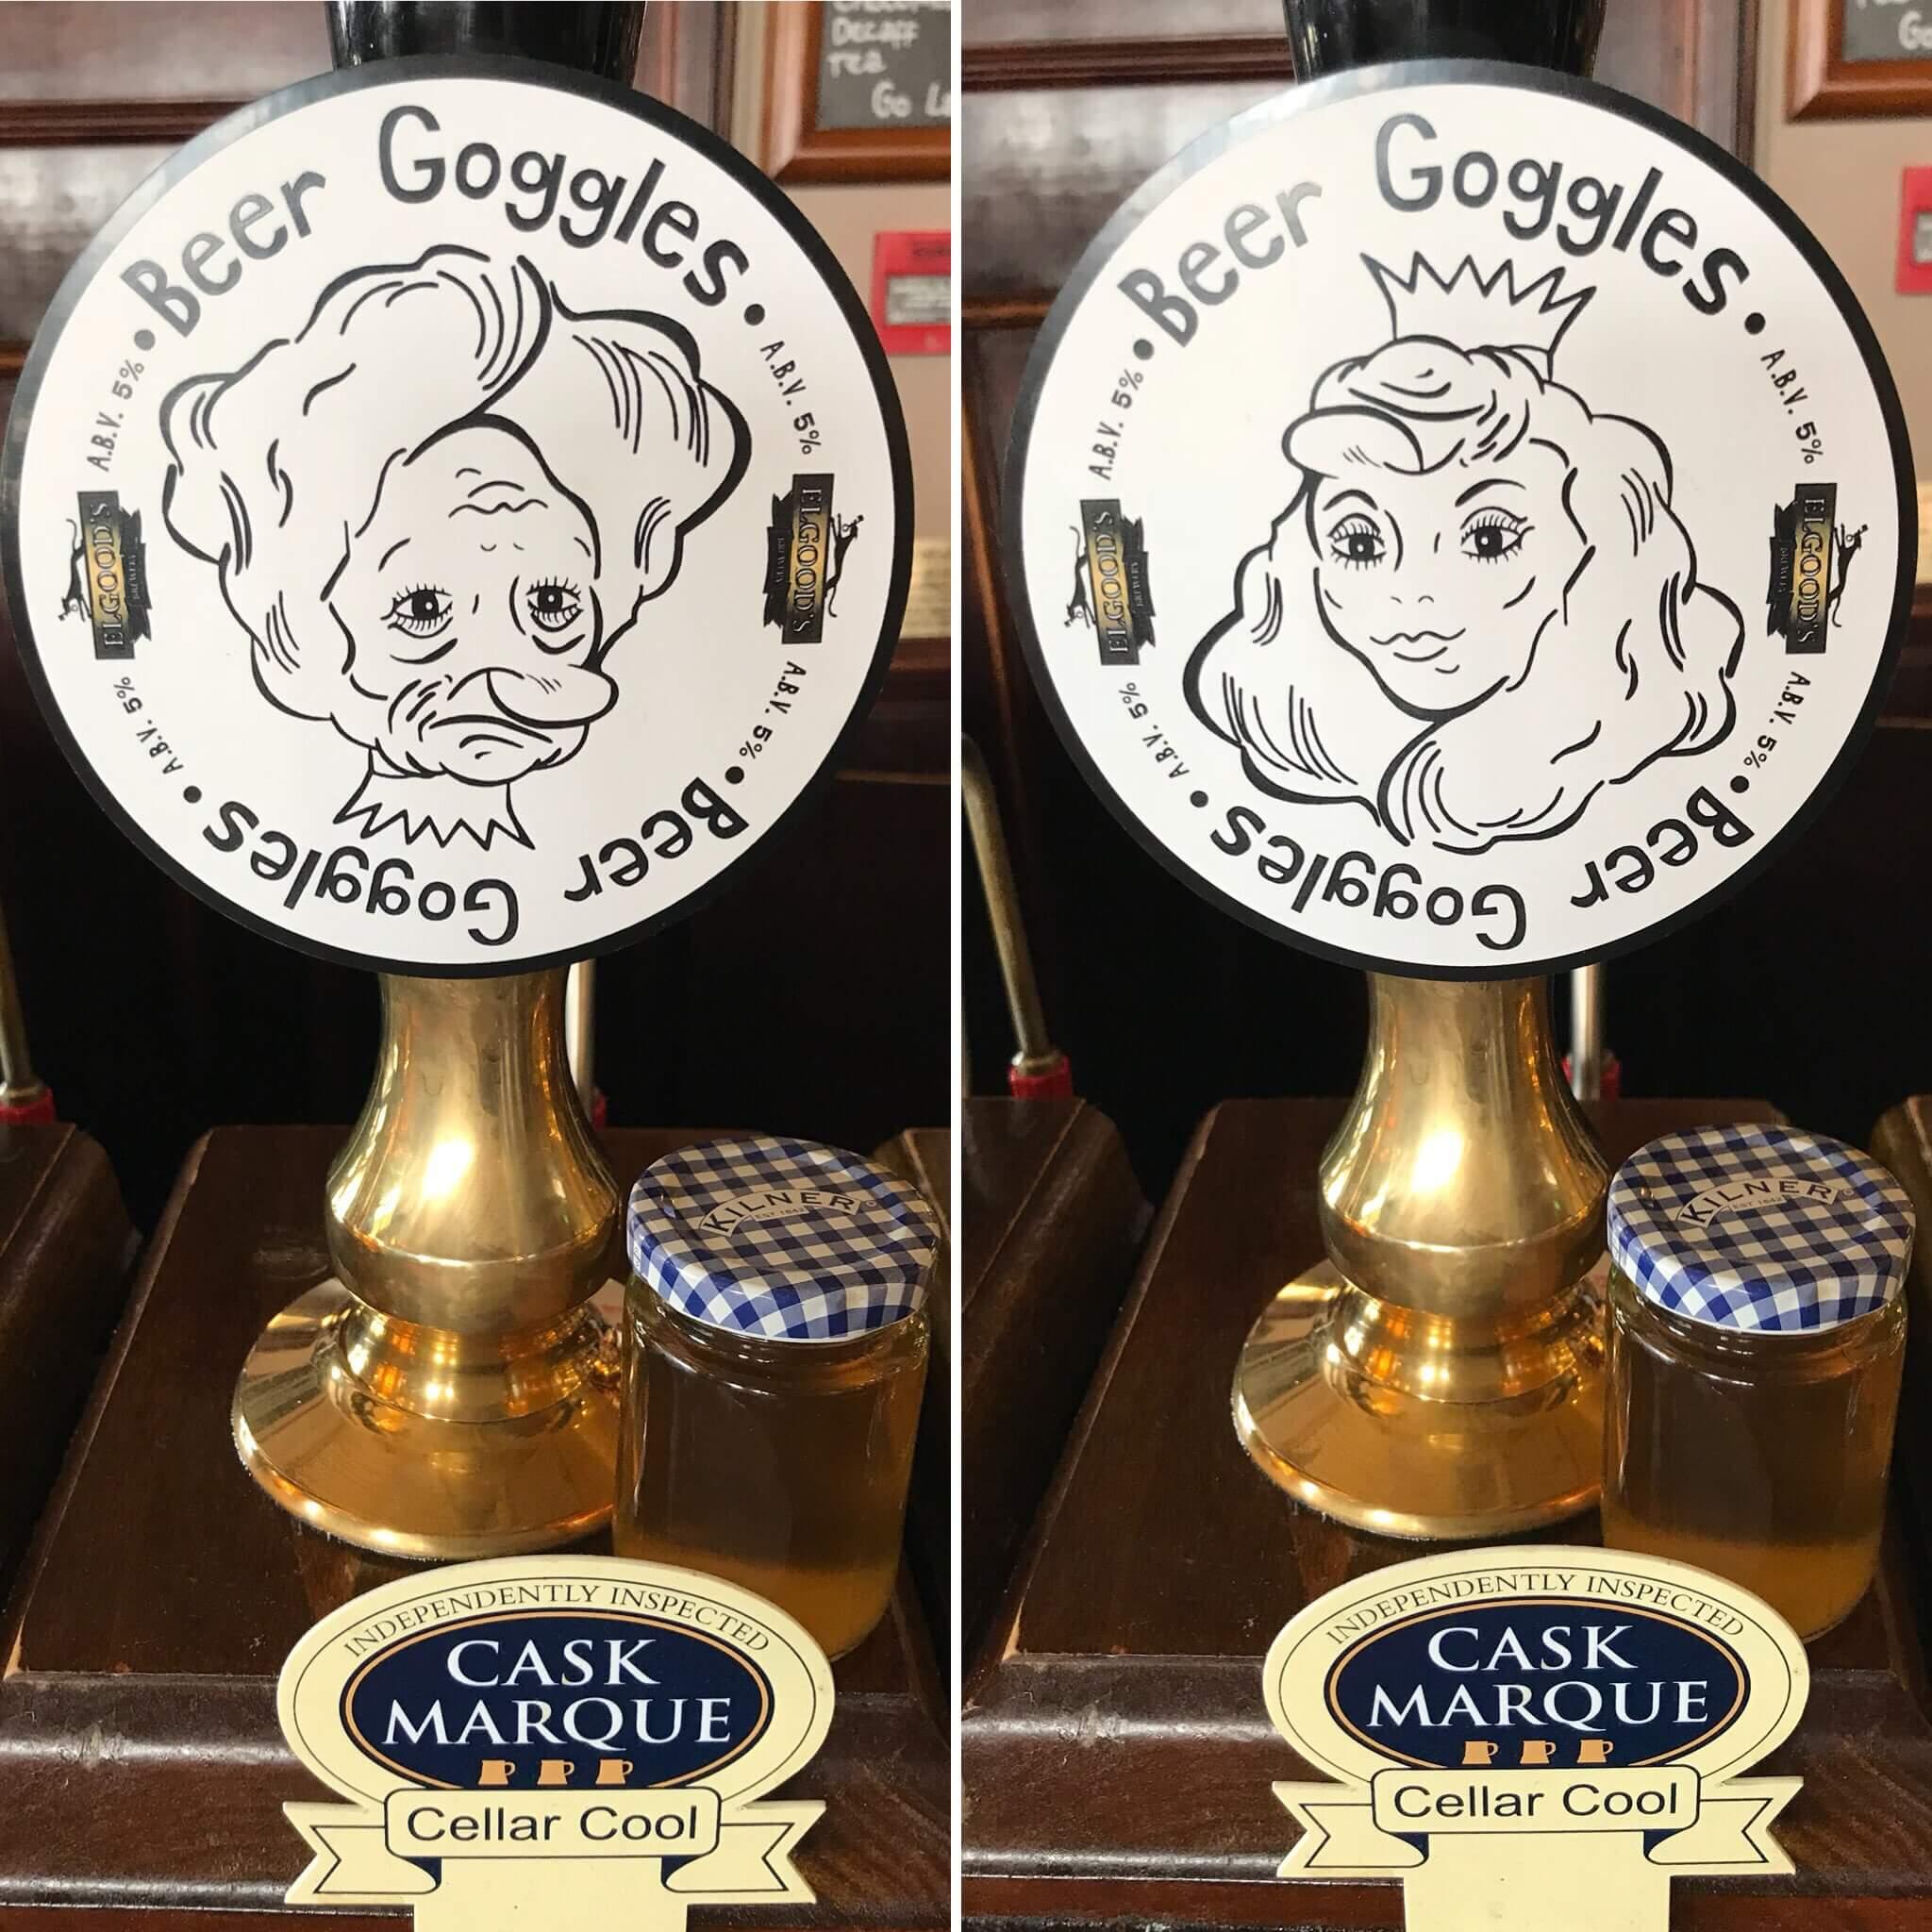 Elgood's — Beer Goggles